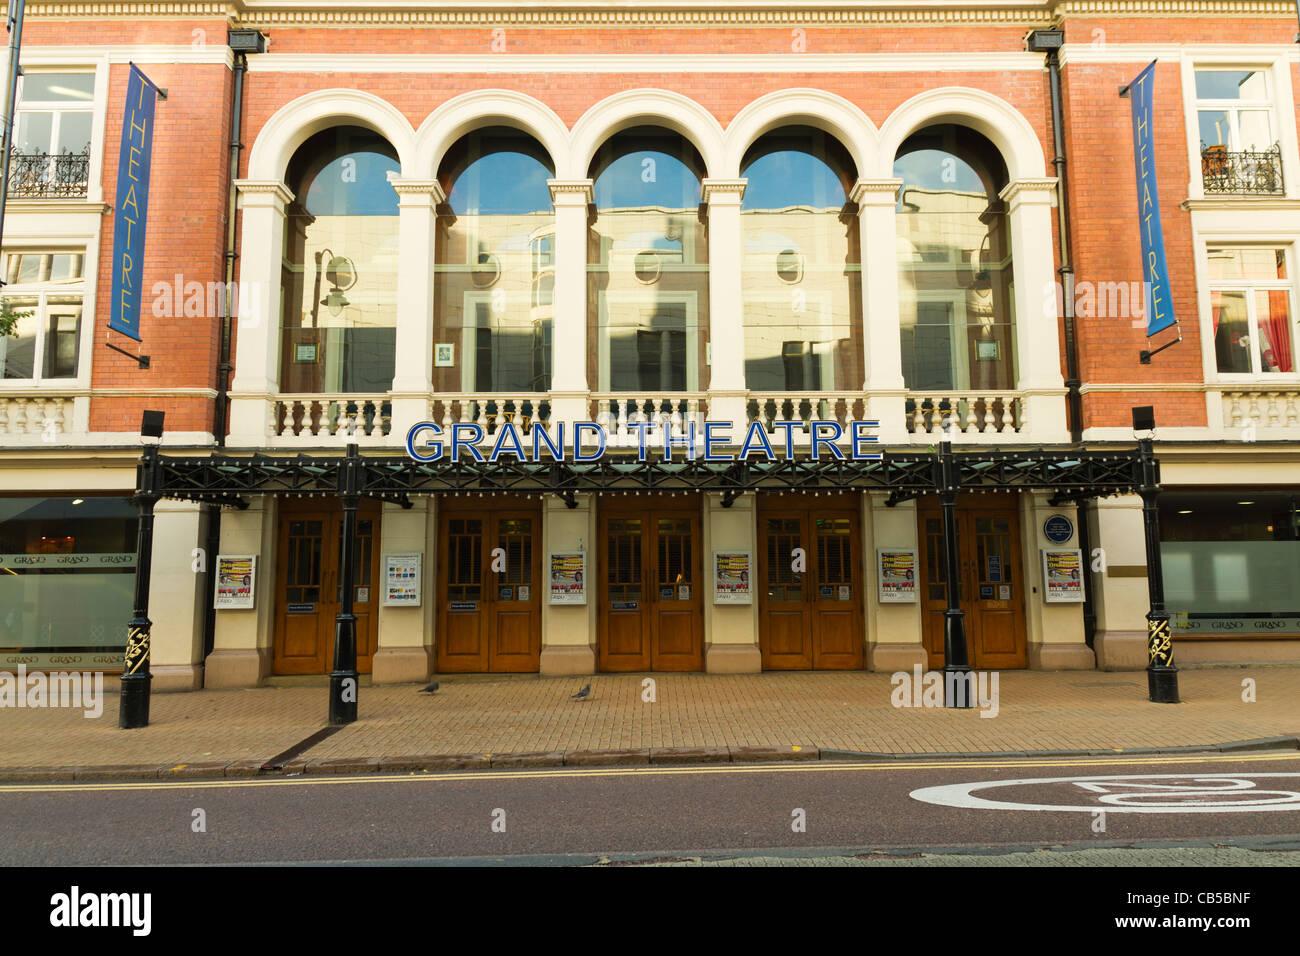 The Grand Theatre in Wolverhampton Stock Photo: 41300939 - Alamy